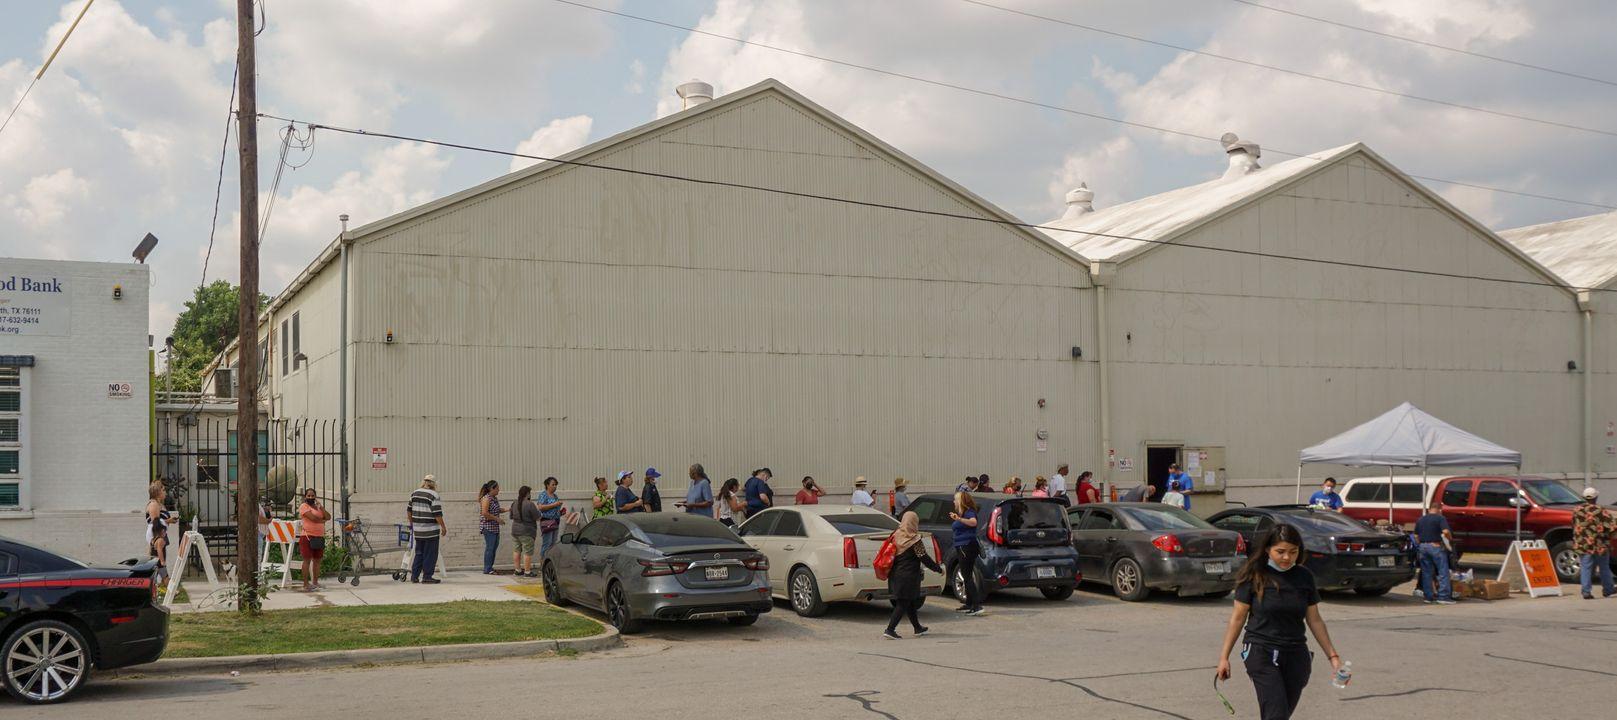 Fort Worth Community Food Bank